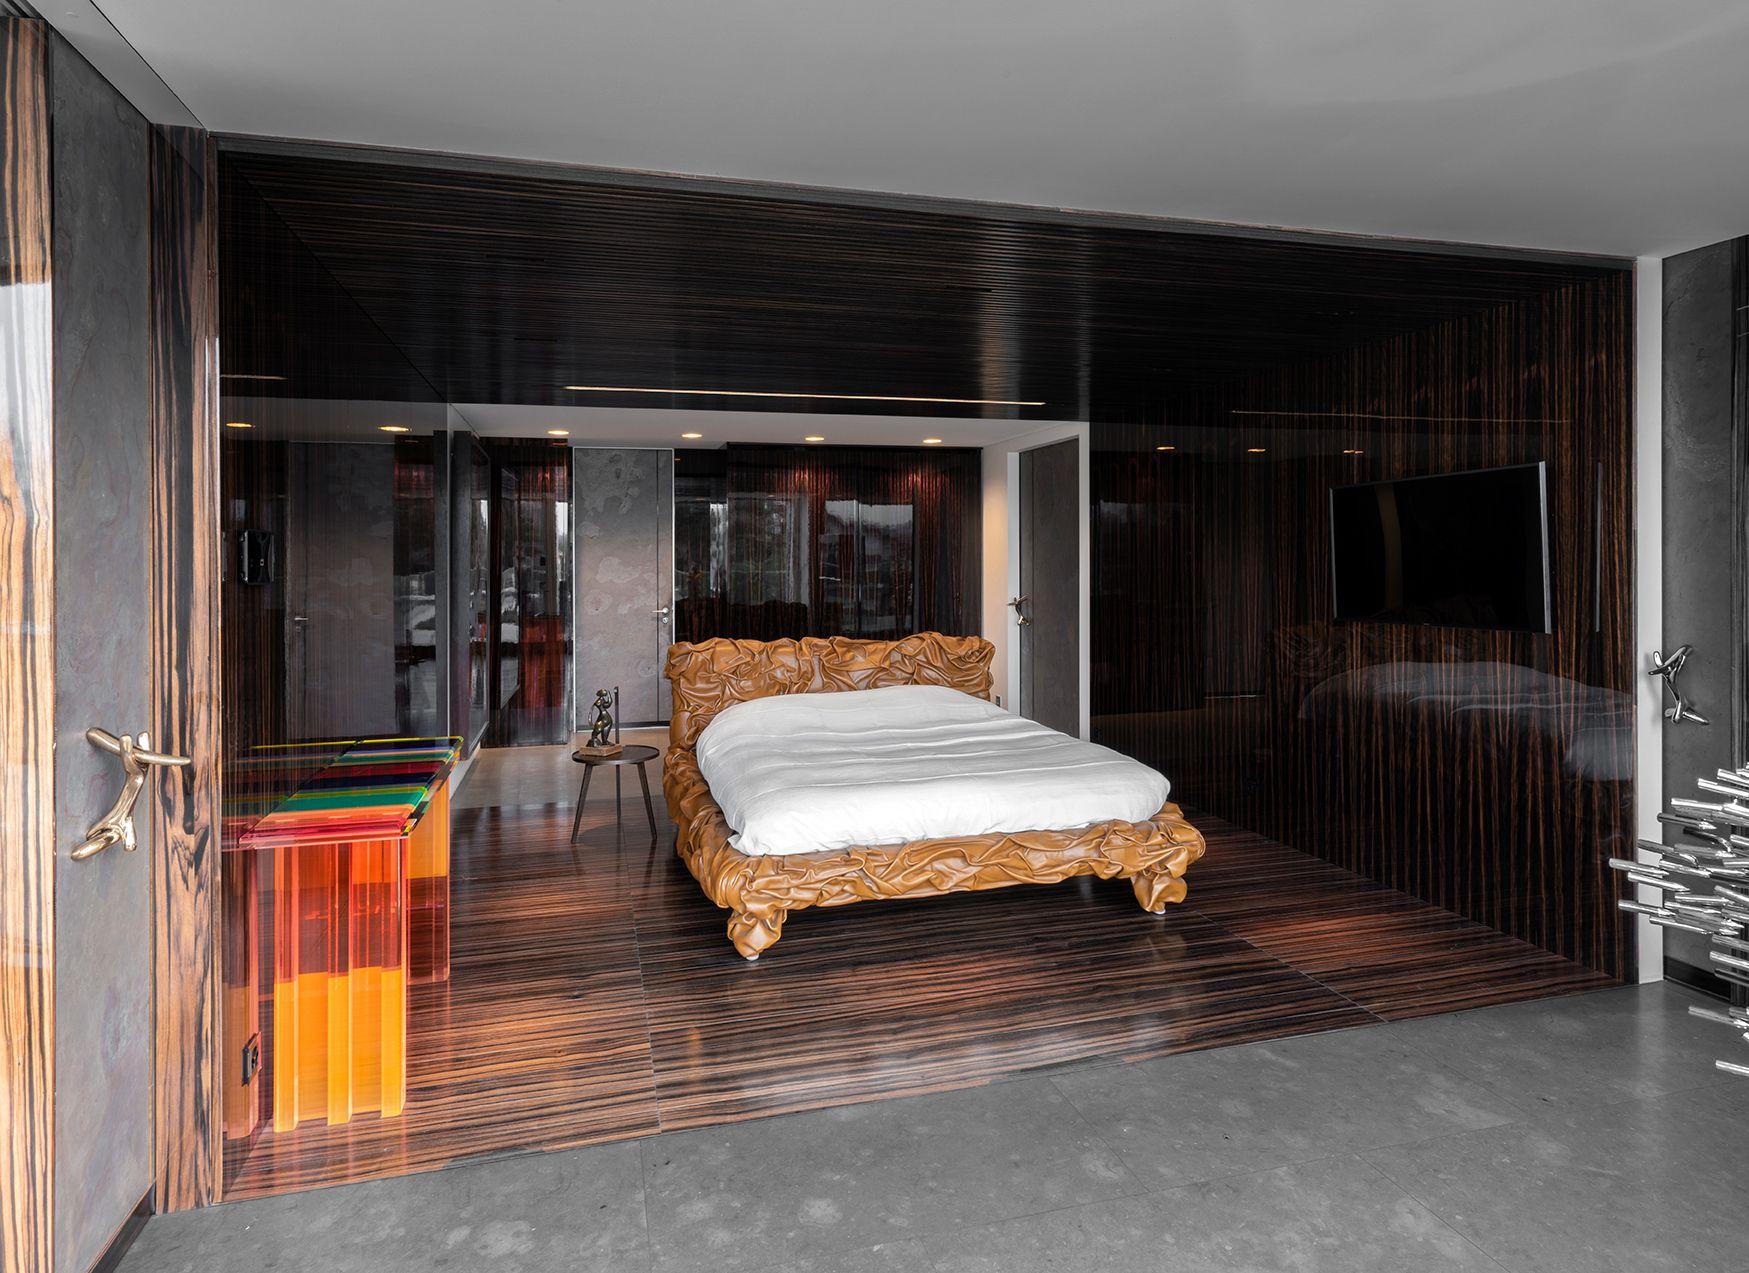 Villa in Svizzera - image 33